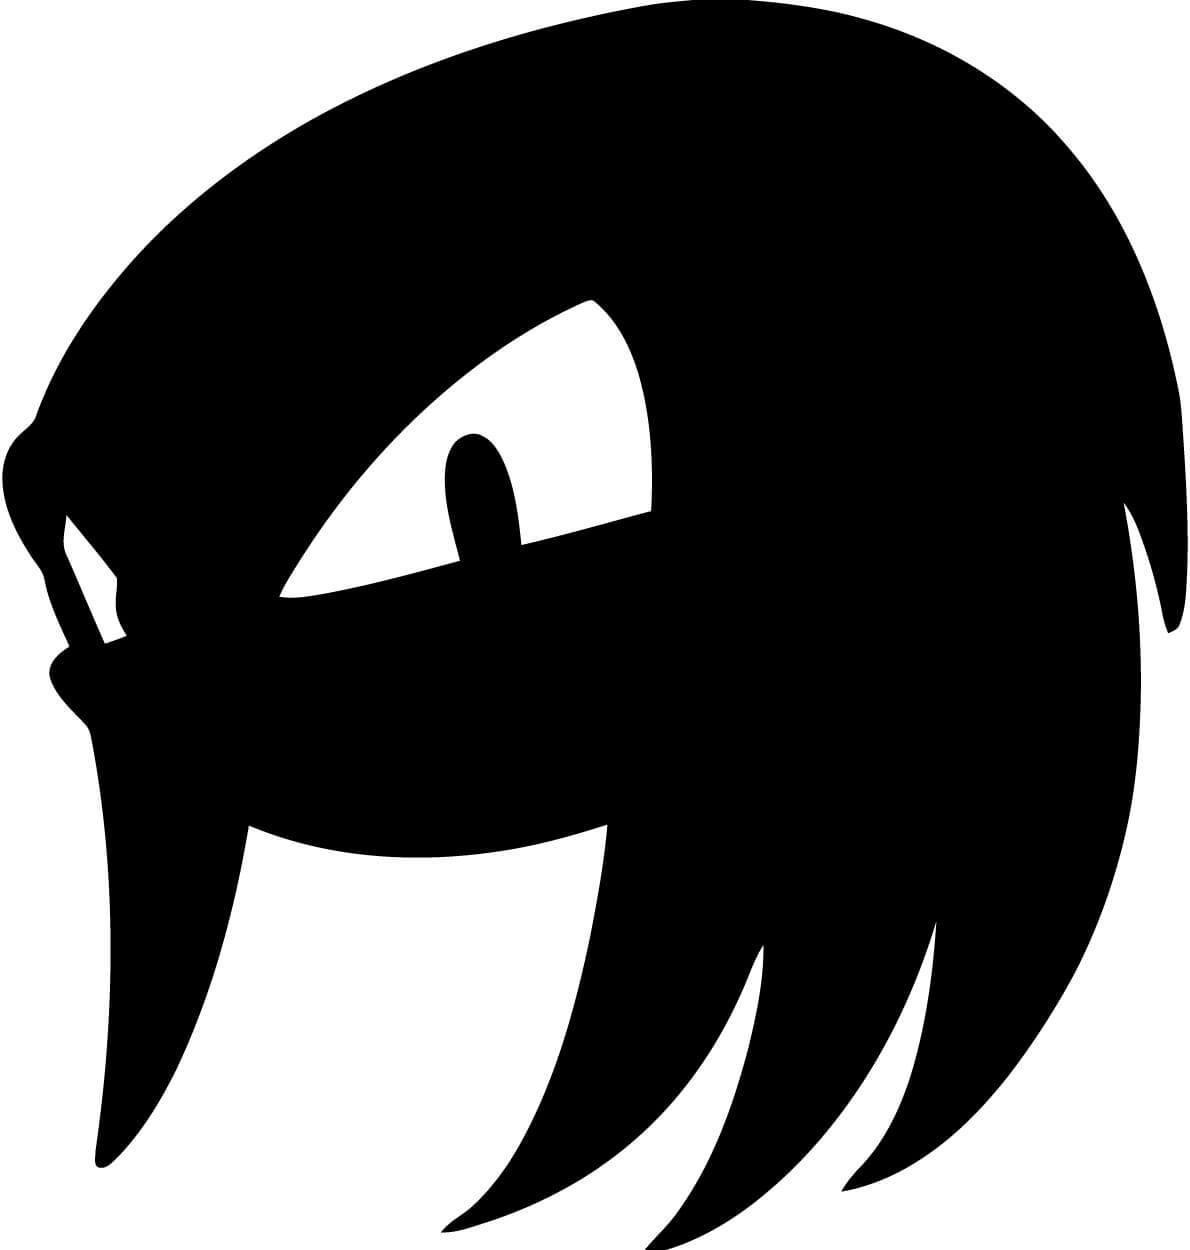 1190x1250 Sonic The Hedgehog